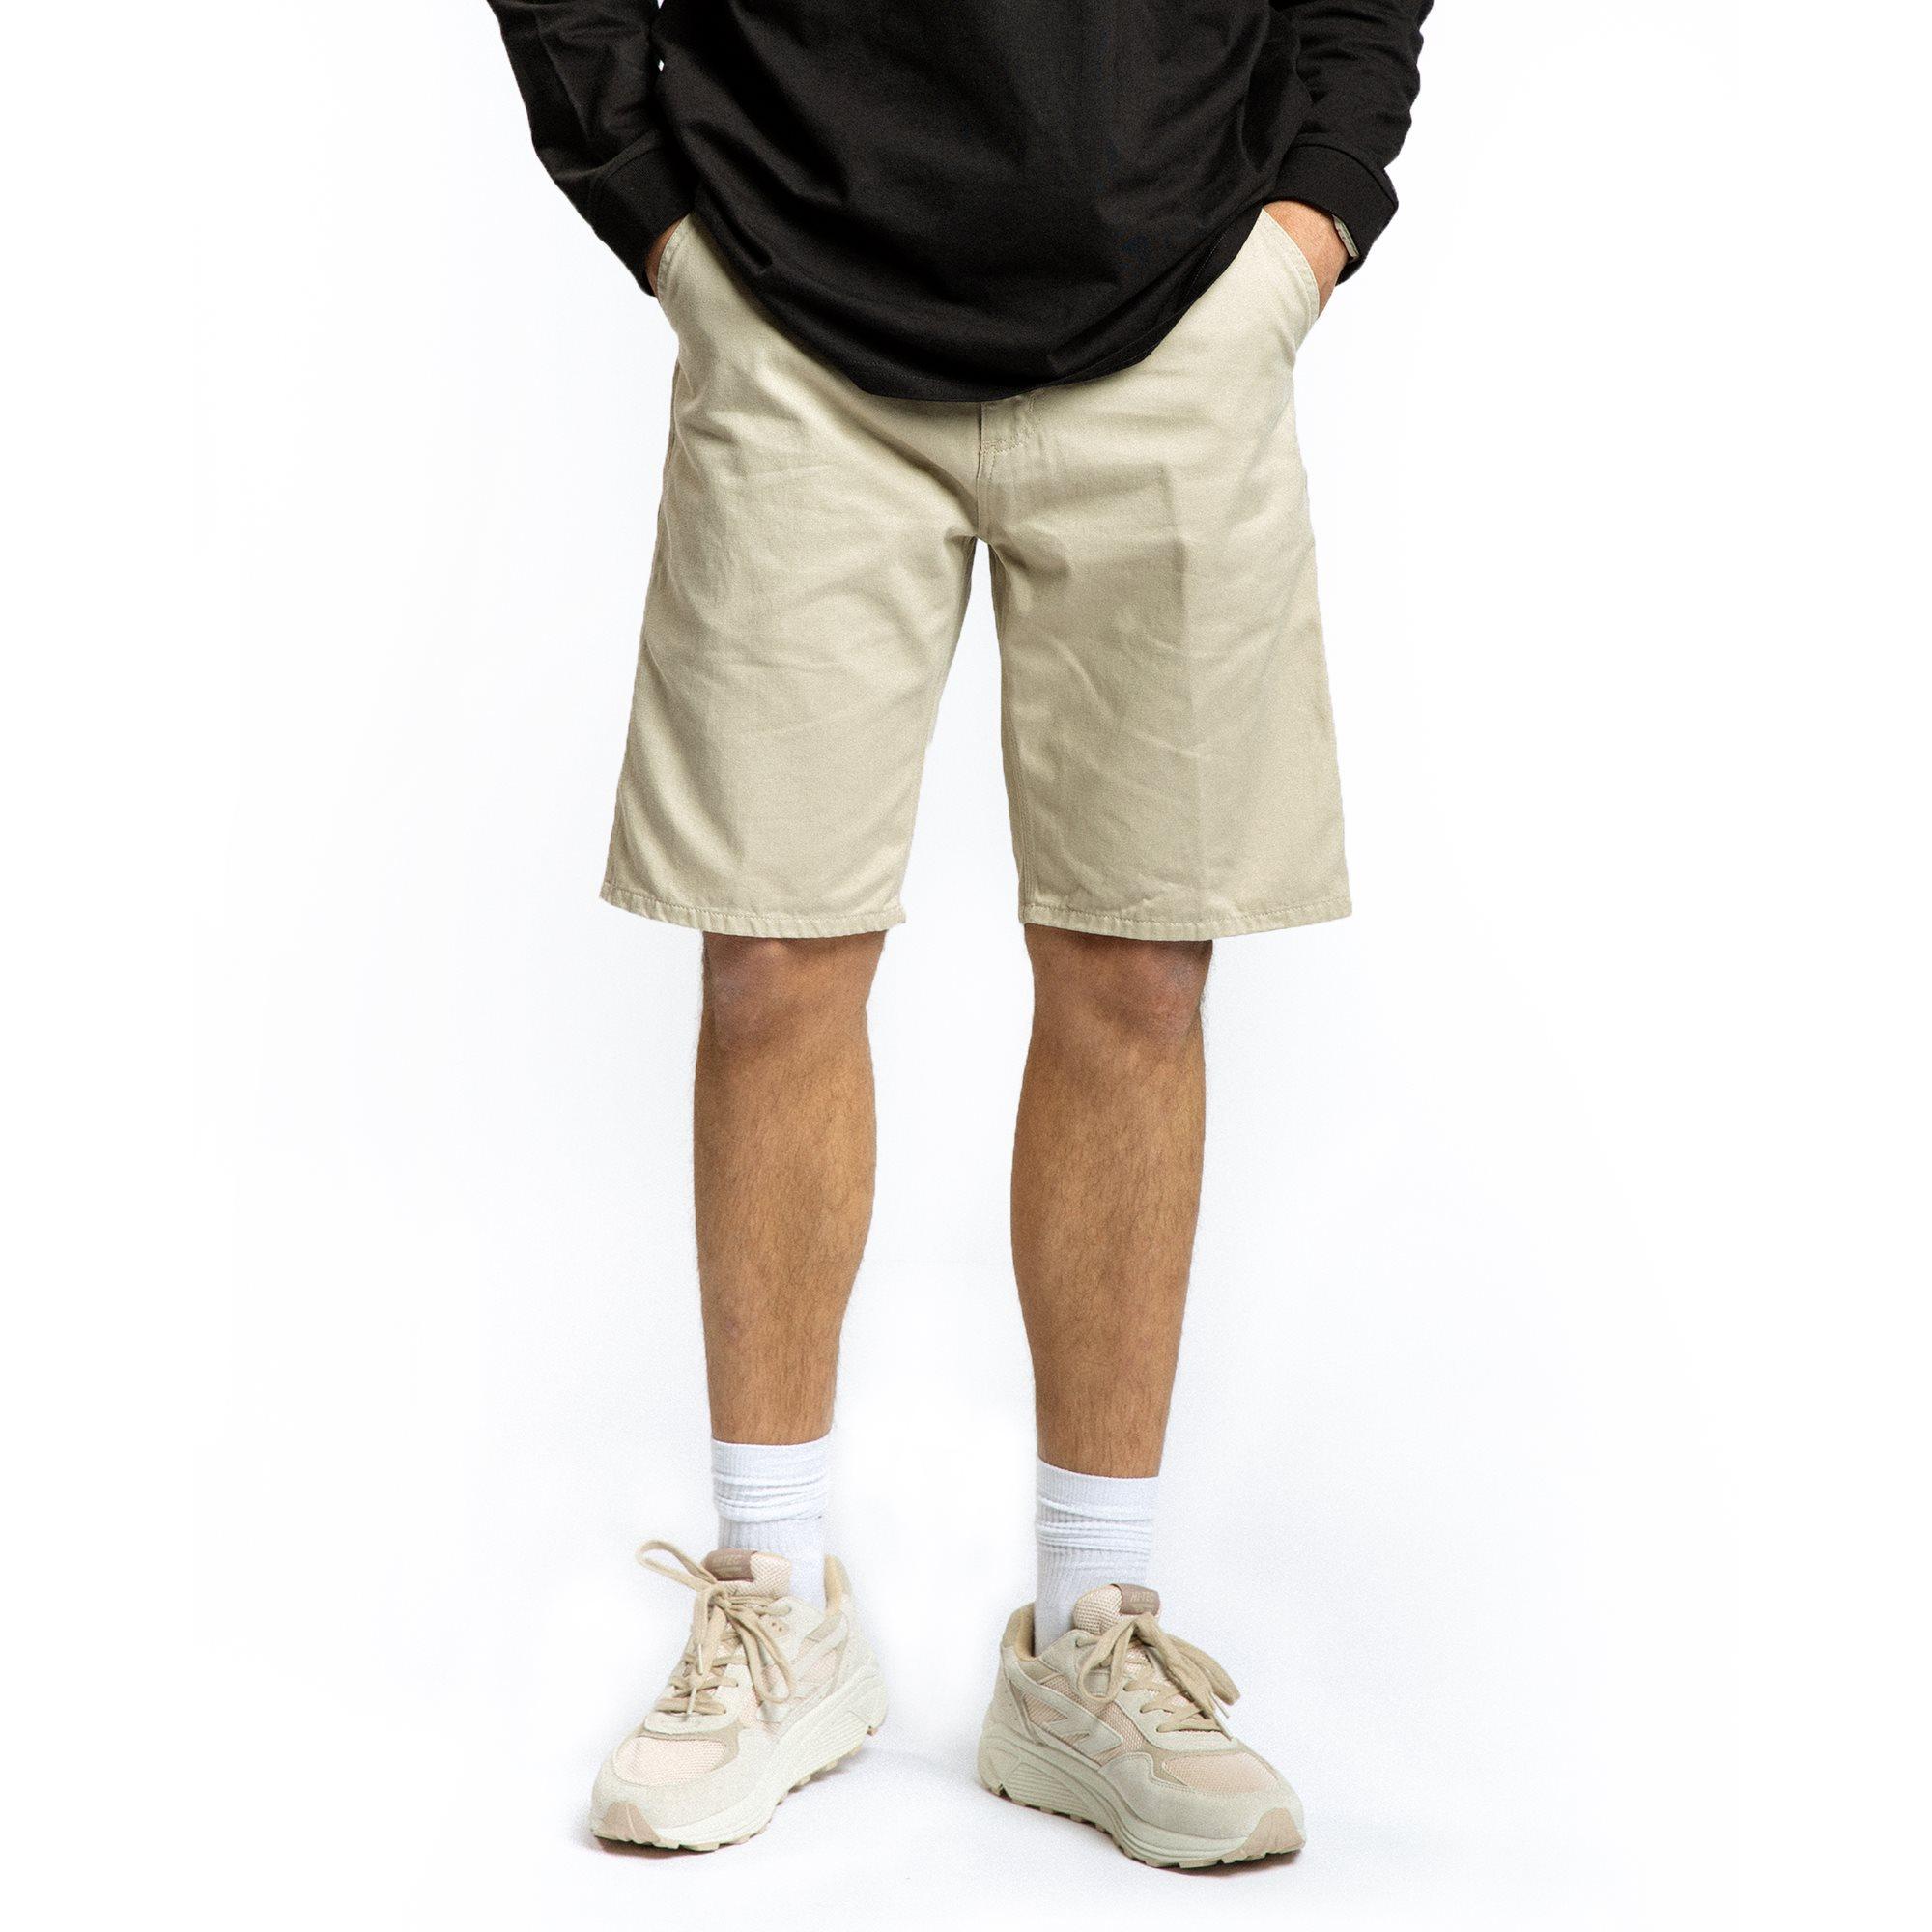 Ruck Single Knee Shorts I024892 - Shorts - Regular fit - Sand